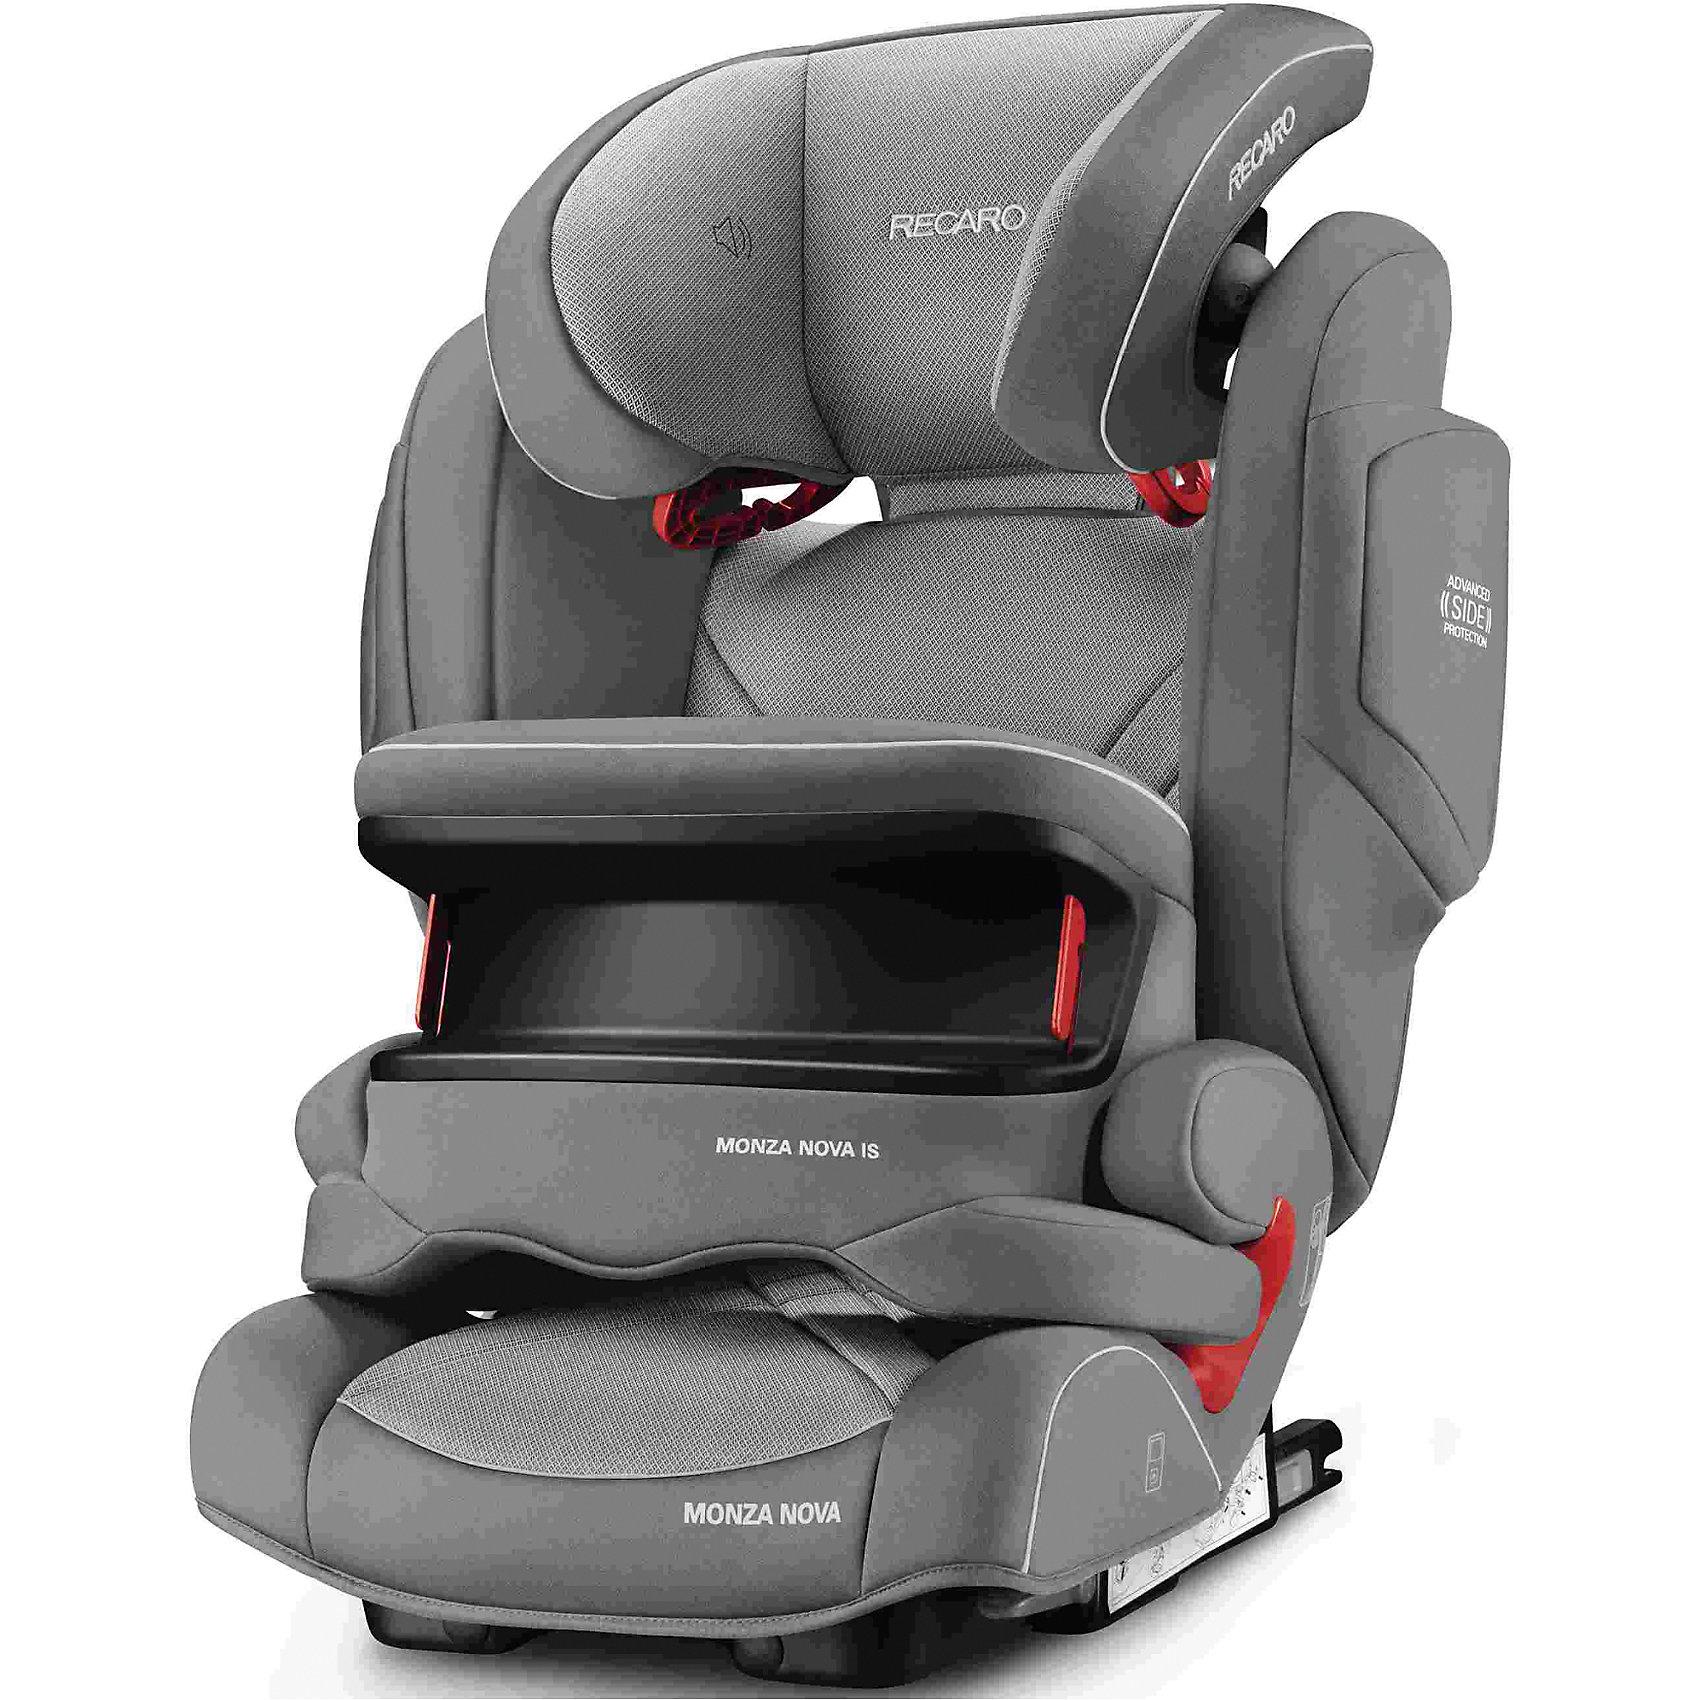 Автокресло Monza Nova IS Seatfix 9-36 кг., Recaro, Alluminum Grey<br><br>Ширина мм: 740<br>Глубина мм: 620<br>Высота мм: 480<br>Вес г: 8000<br>Возраст от месяцев: 9<br>Возраст до месяцев: 144<br>Пол: Унисекс<br>Возраст: Детский<br>SKU: 5396735